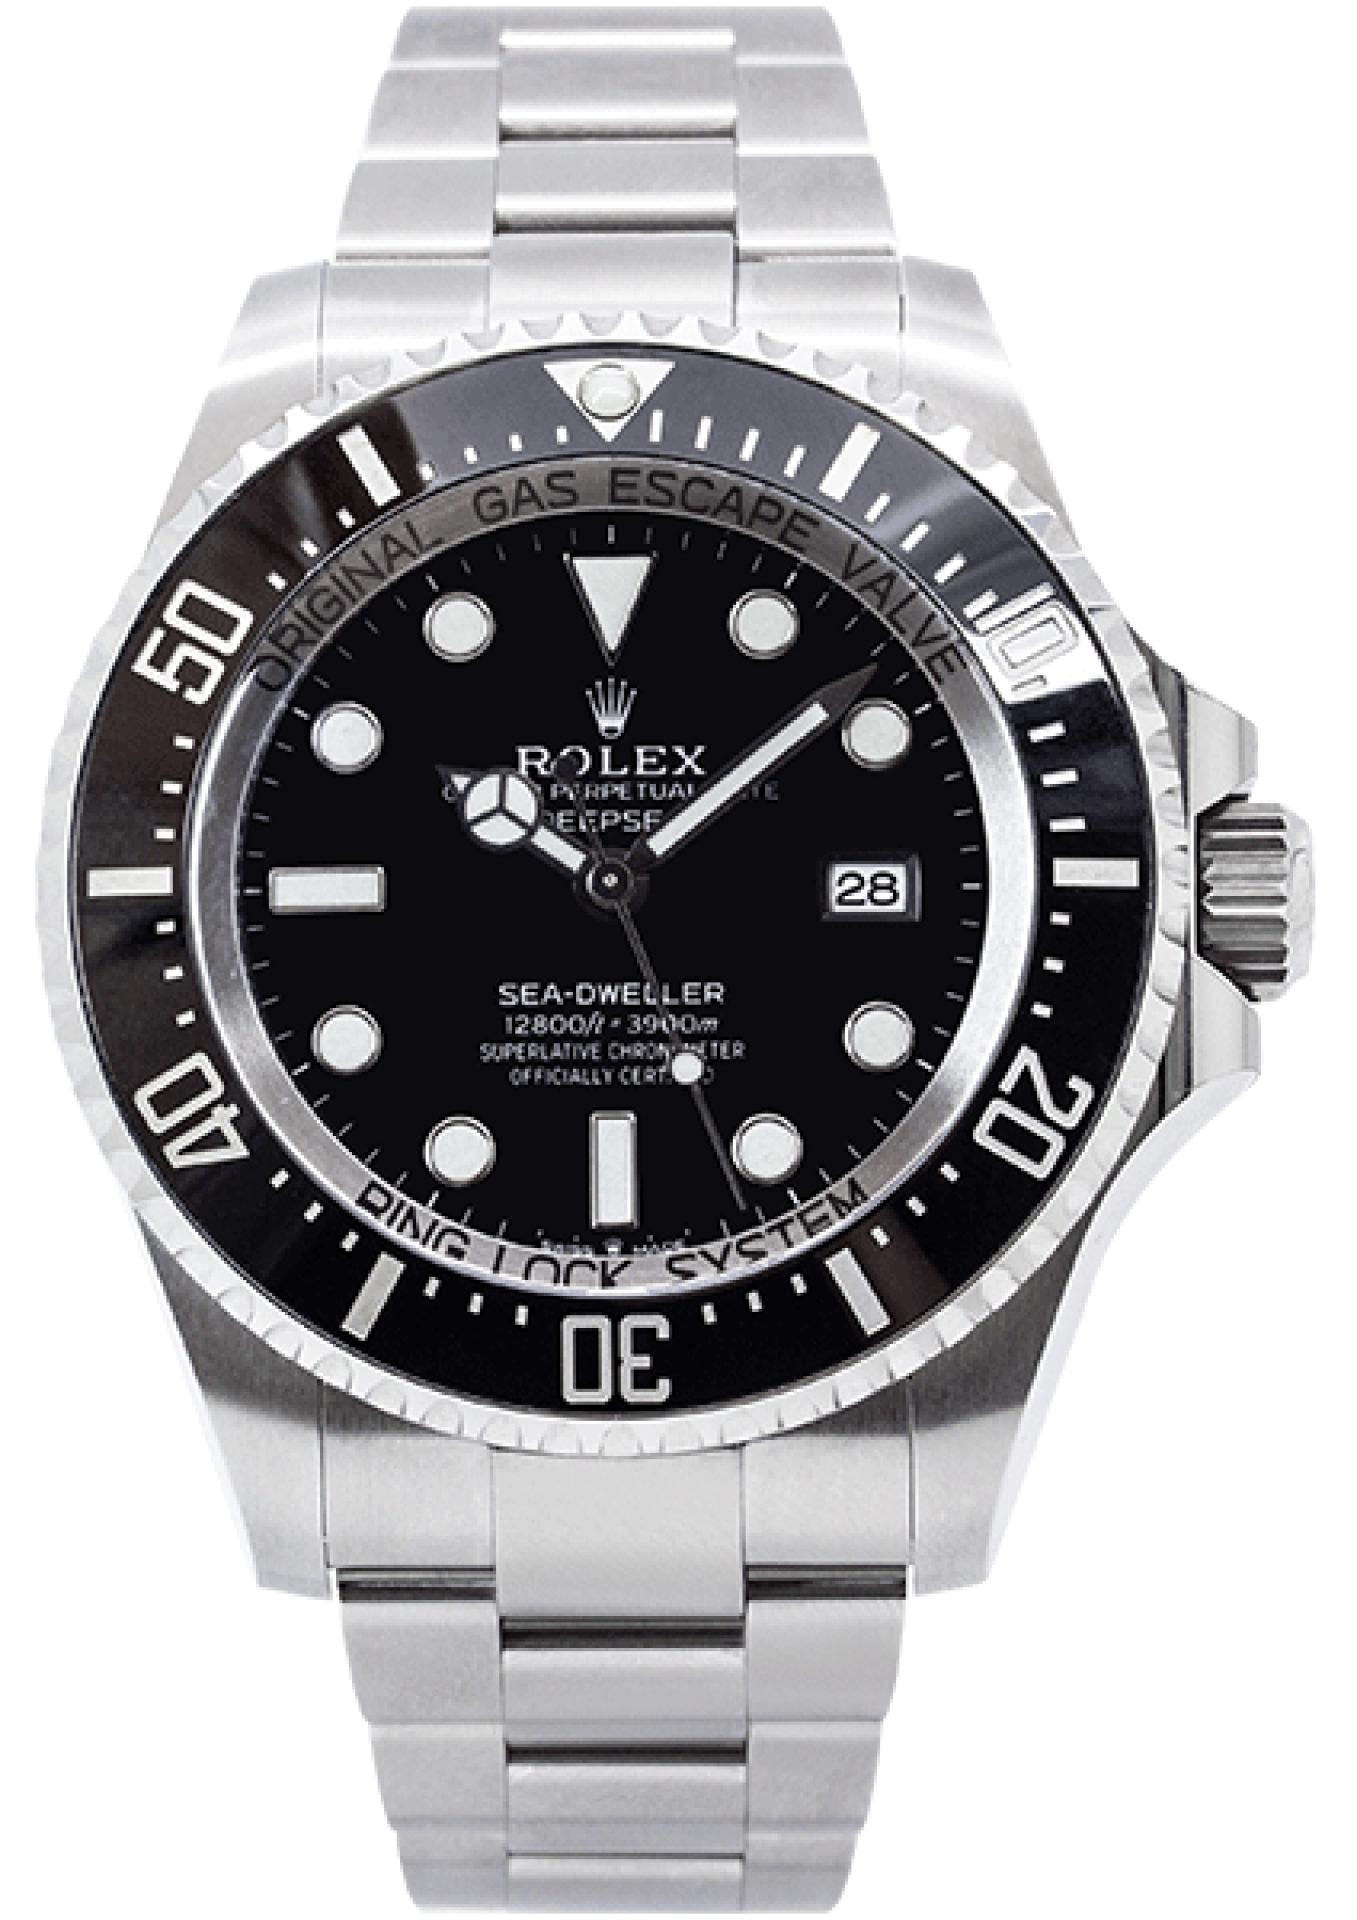 Rolex Oyster Perpetual Sea-Dweller Deepsea 126660